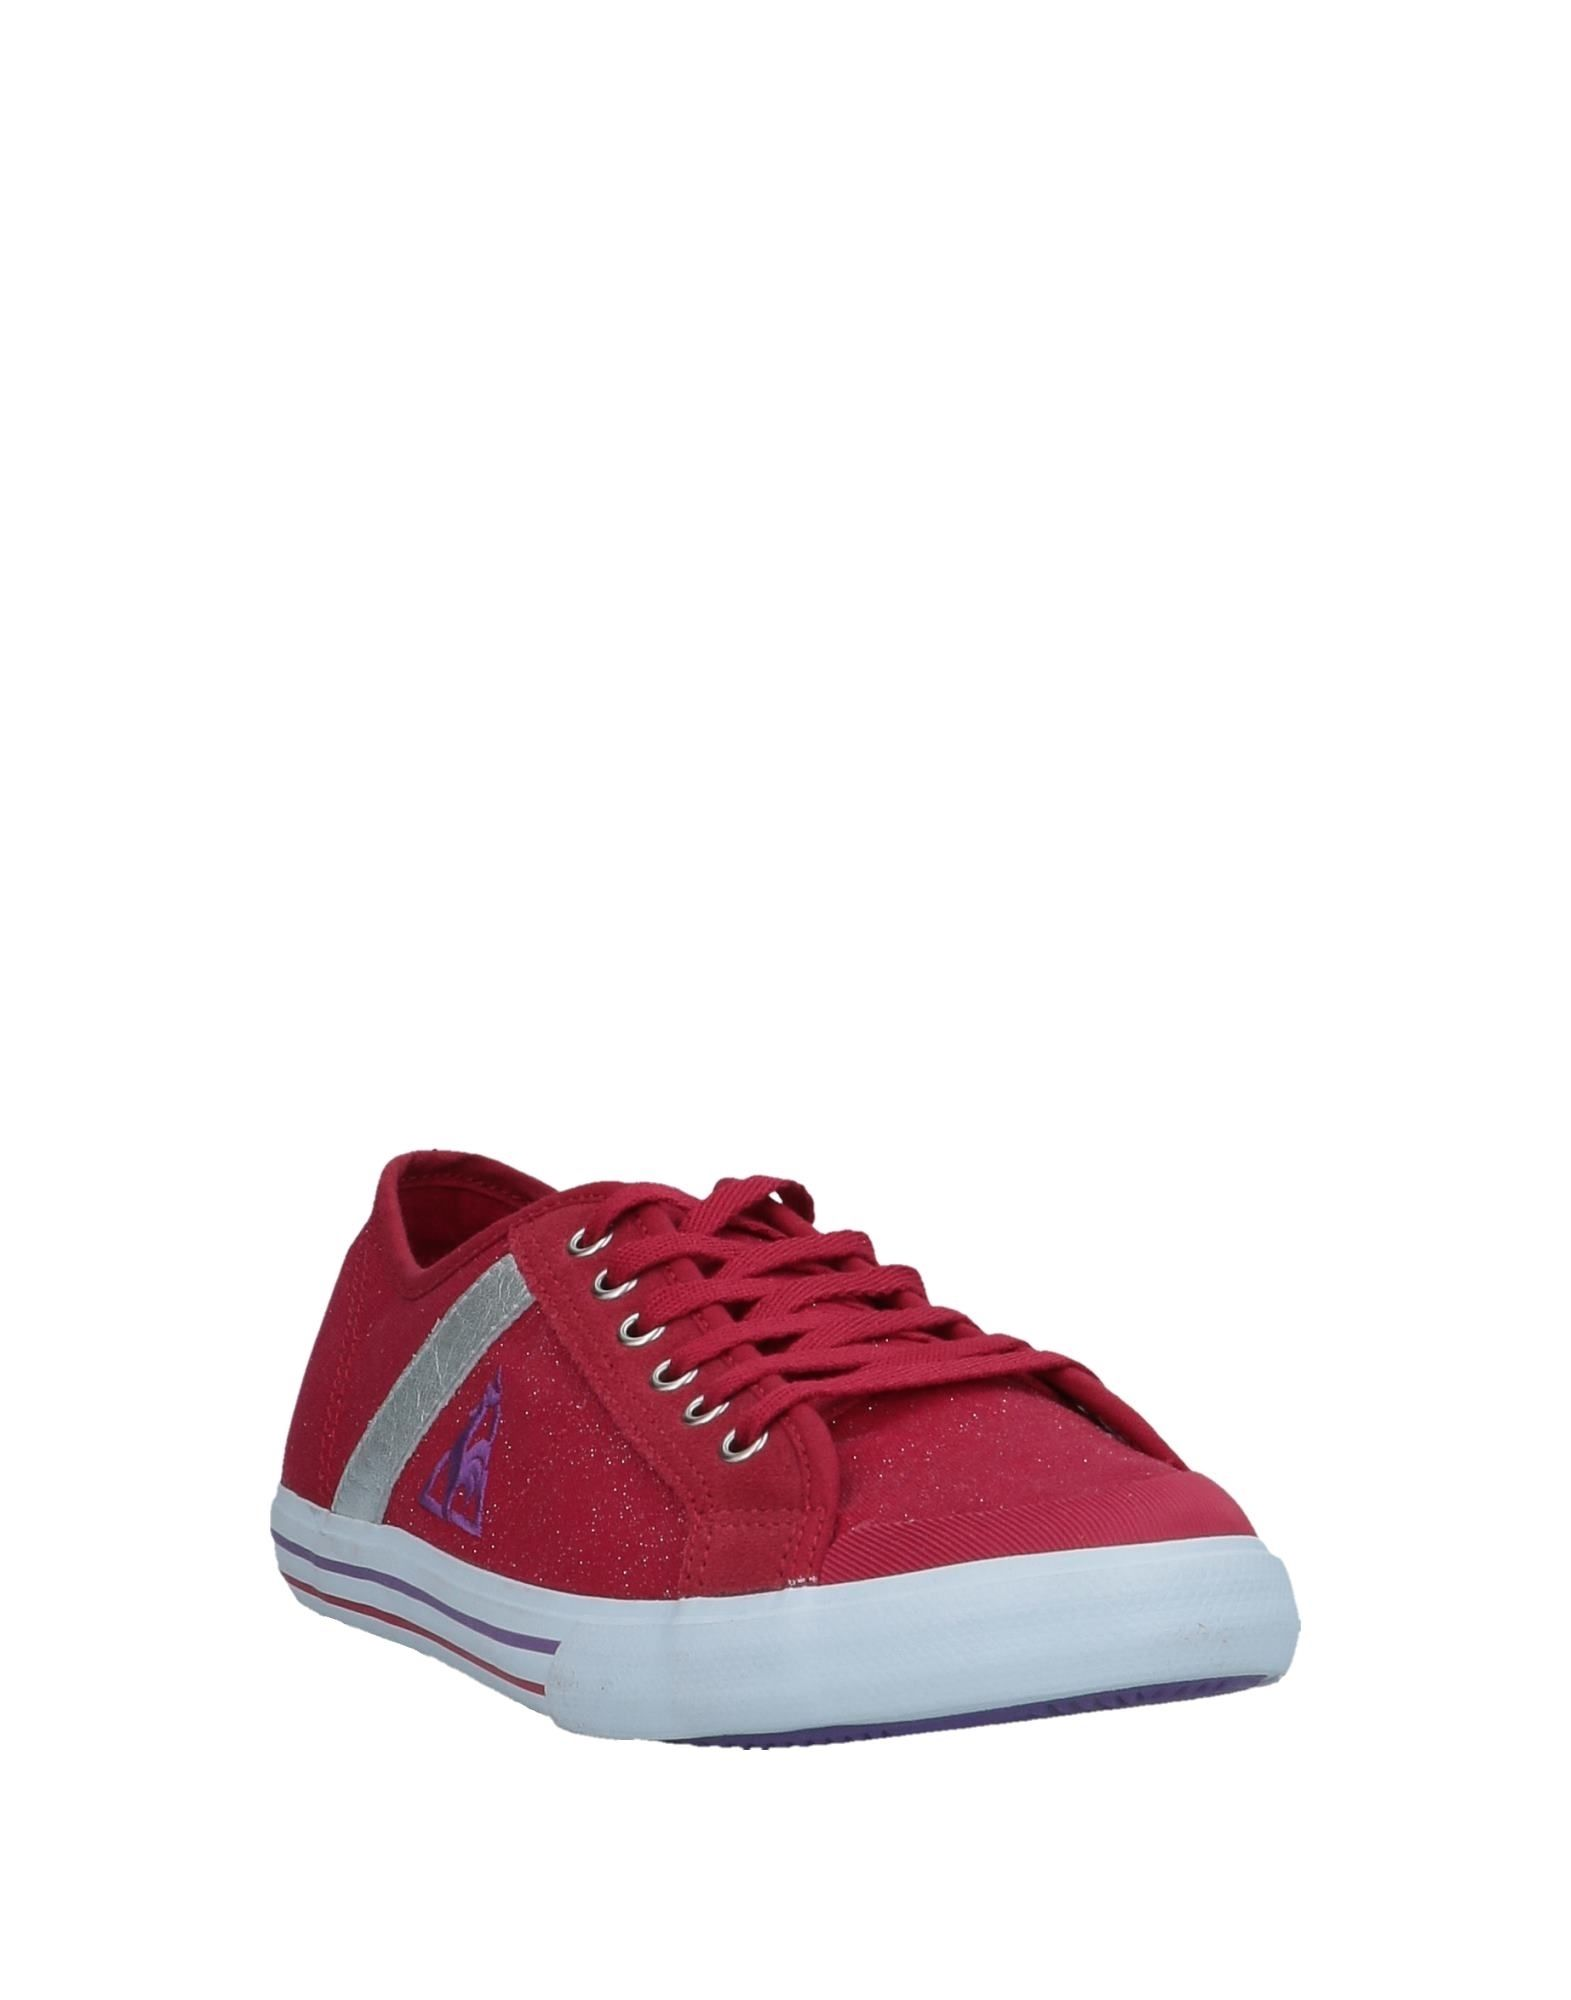 Le Coq Sportif Sneakers Qualität Damen  11536904CN Gute Qualität Sneakers beliebte Schuhe 3f6461